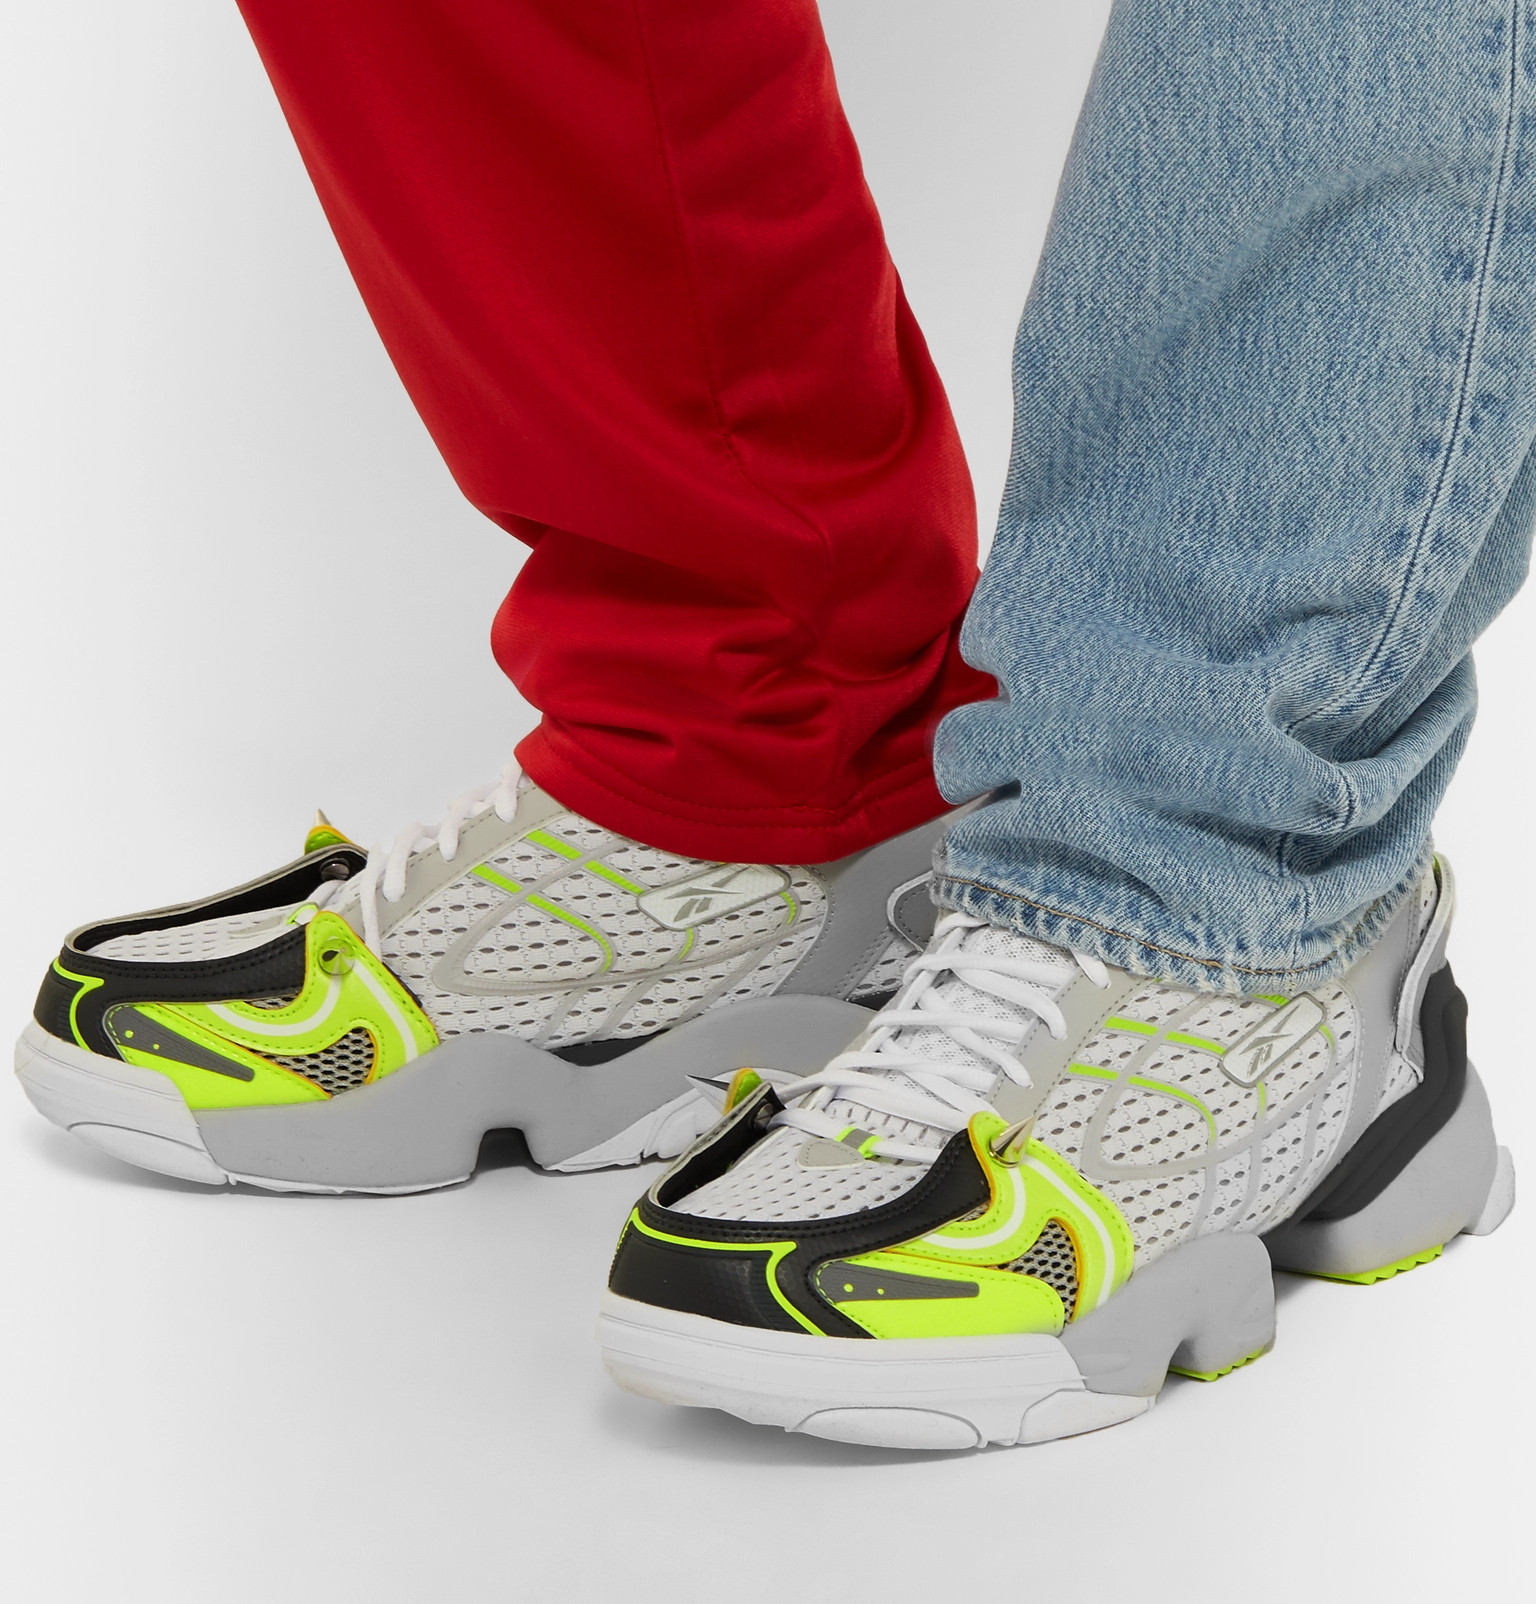 f9803e529399 Vetements - + Reebok Spike Runner 400 Rubber-Trimmed Mesh Sneakers